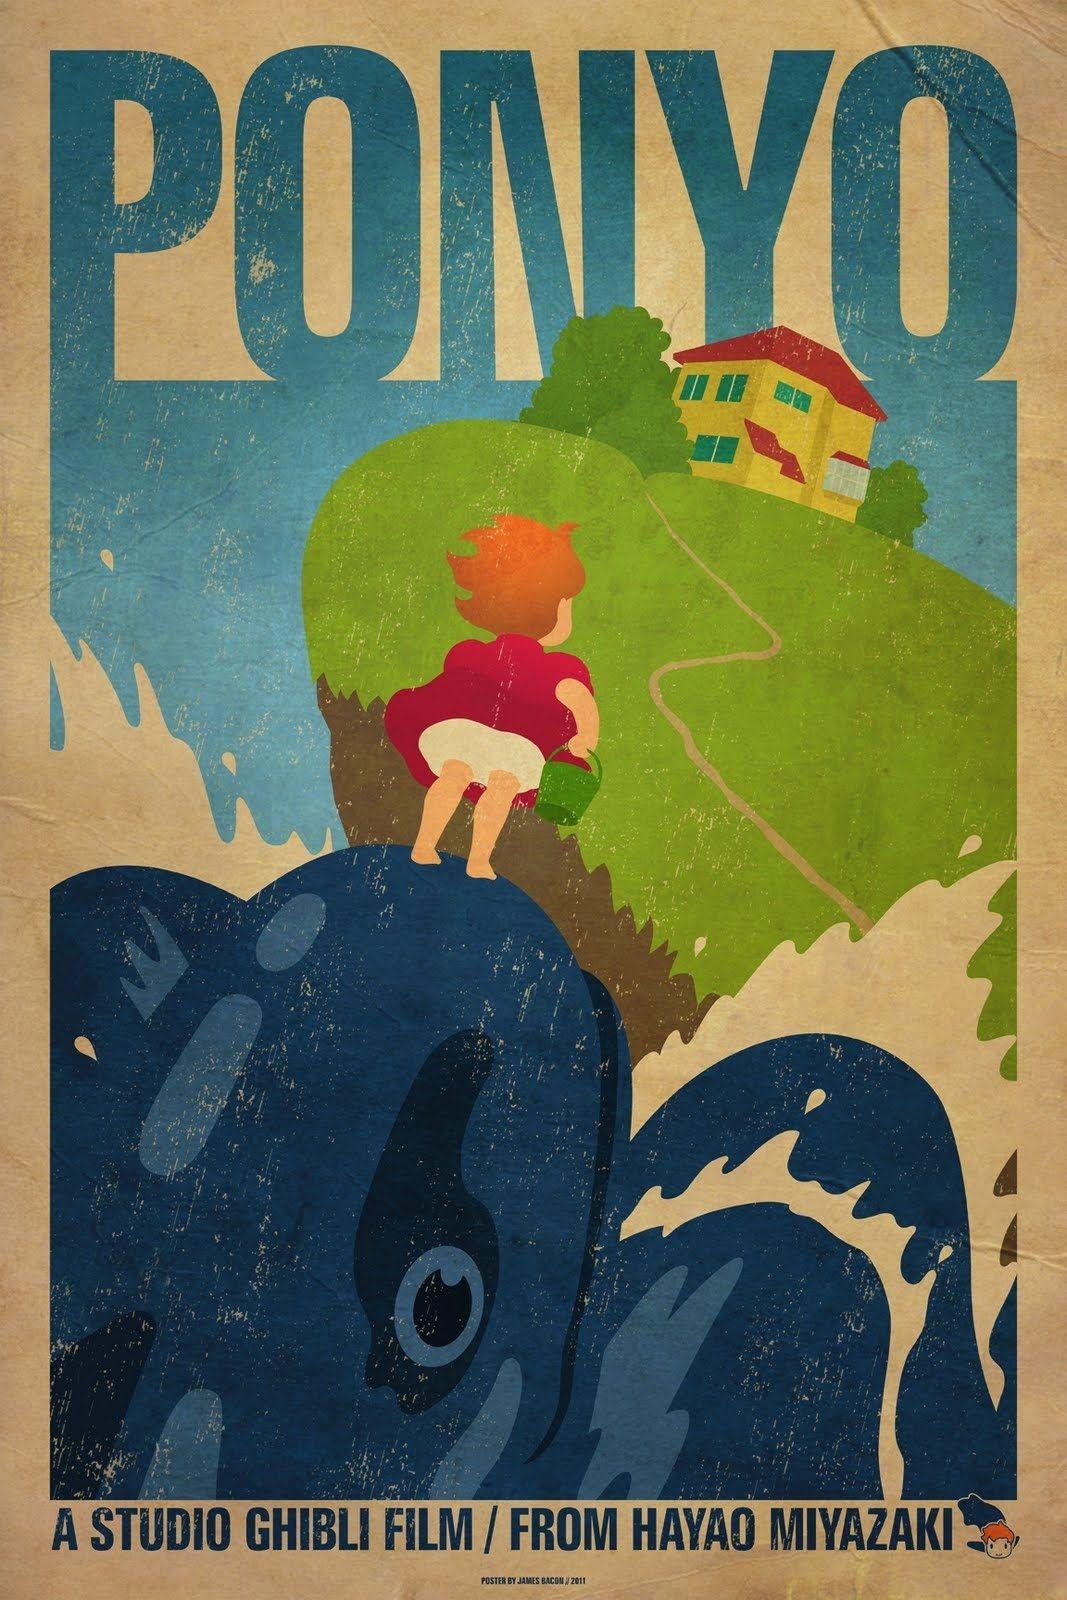 Download Film Ponyo : download, ponyo, Ponyo-poster-wallpaper-for-free-screensaver-cartoons-images-ponyo-movie, -wallpaper-hd-iphone-widescreen-download-desktop-live-ipad-77…, Studio, Ghibli,, Ponyo,, Ghibli